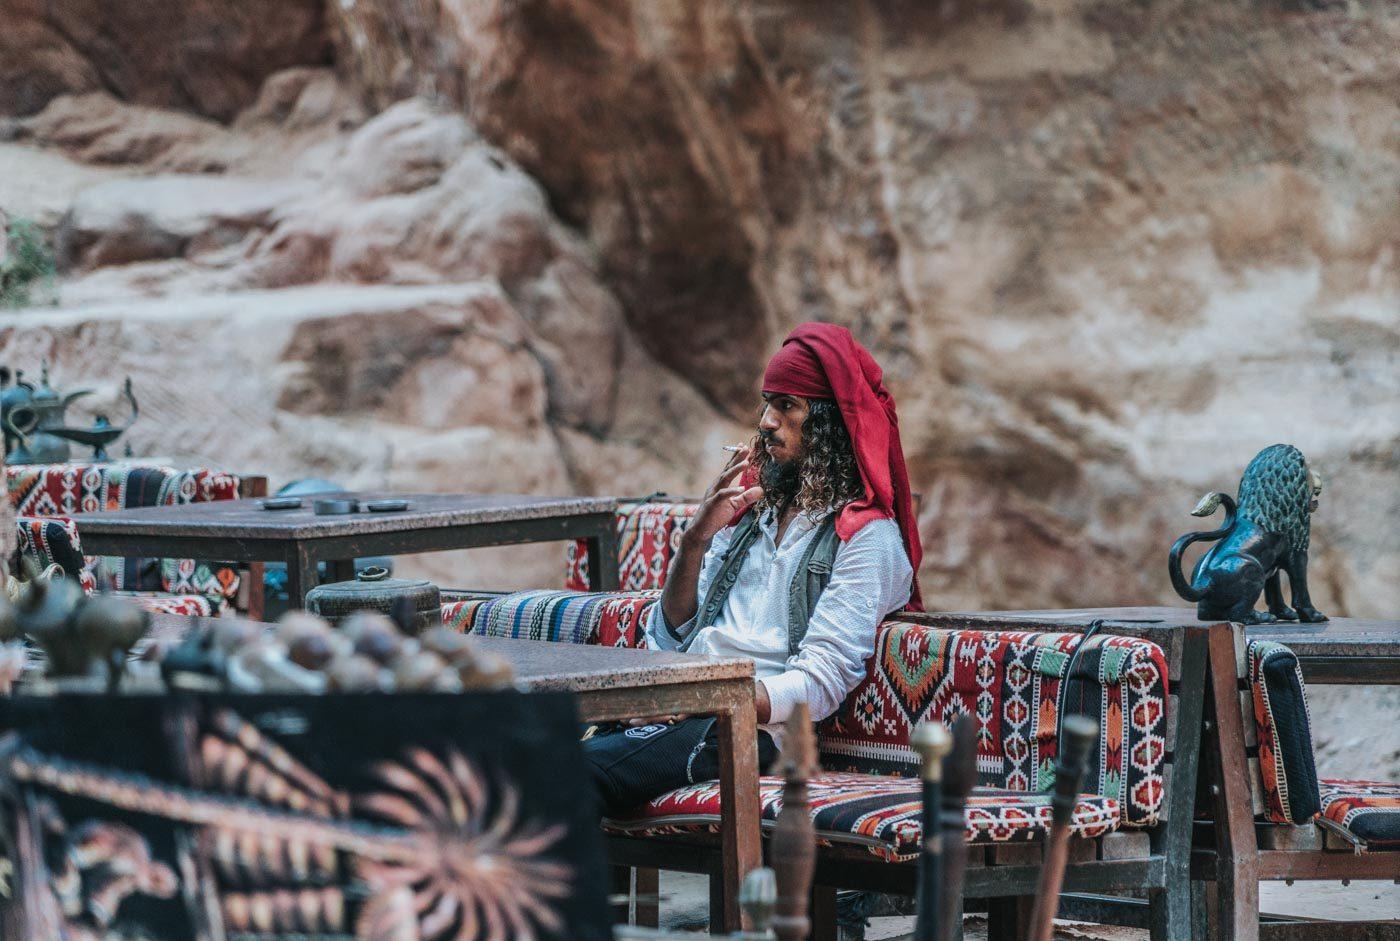 Jack Sparrow look-alike at a shop in Petra, Jordan